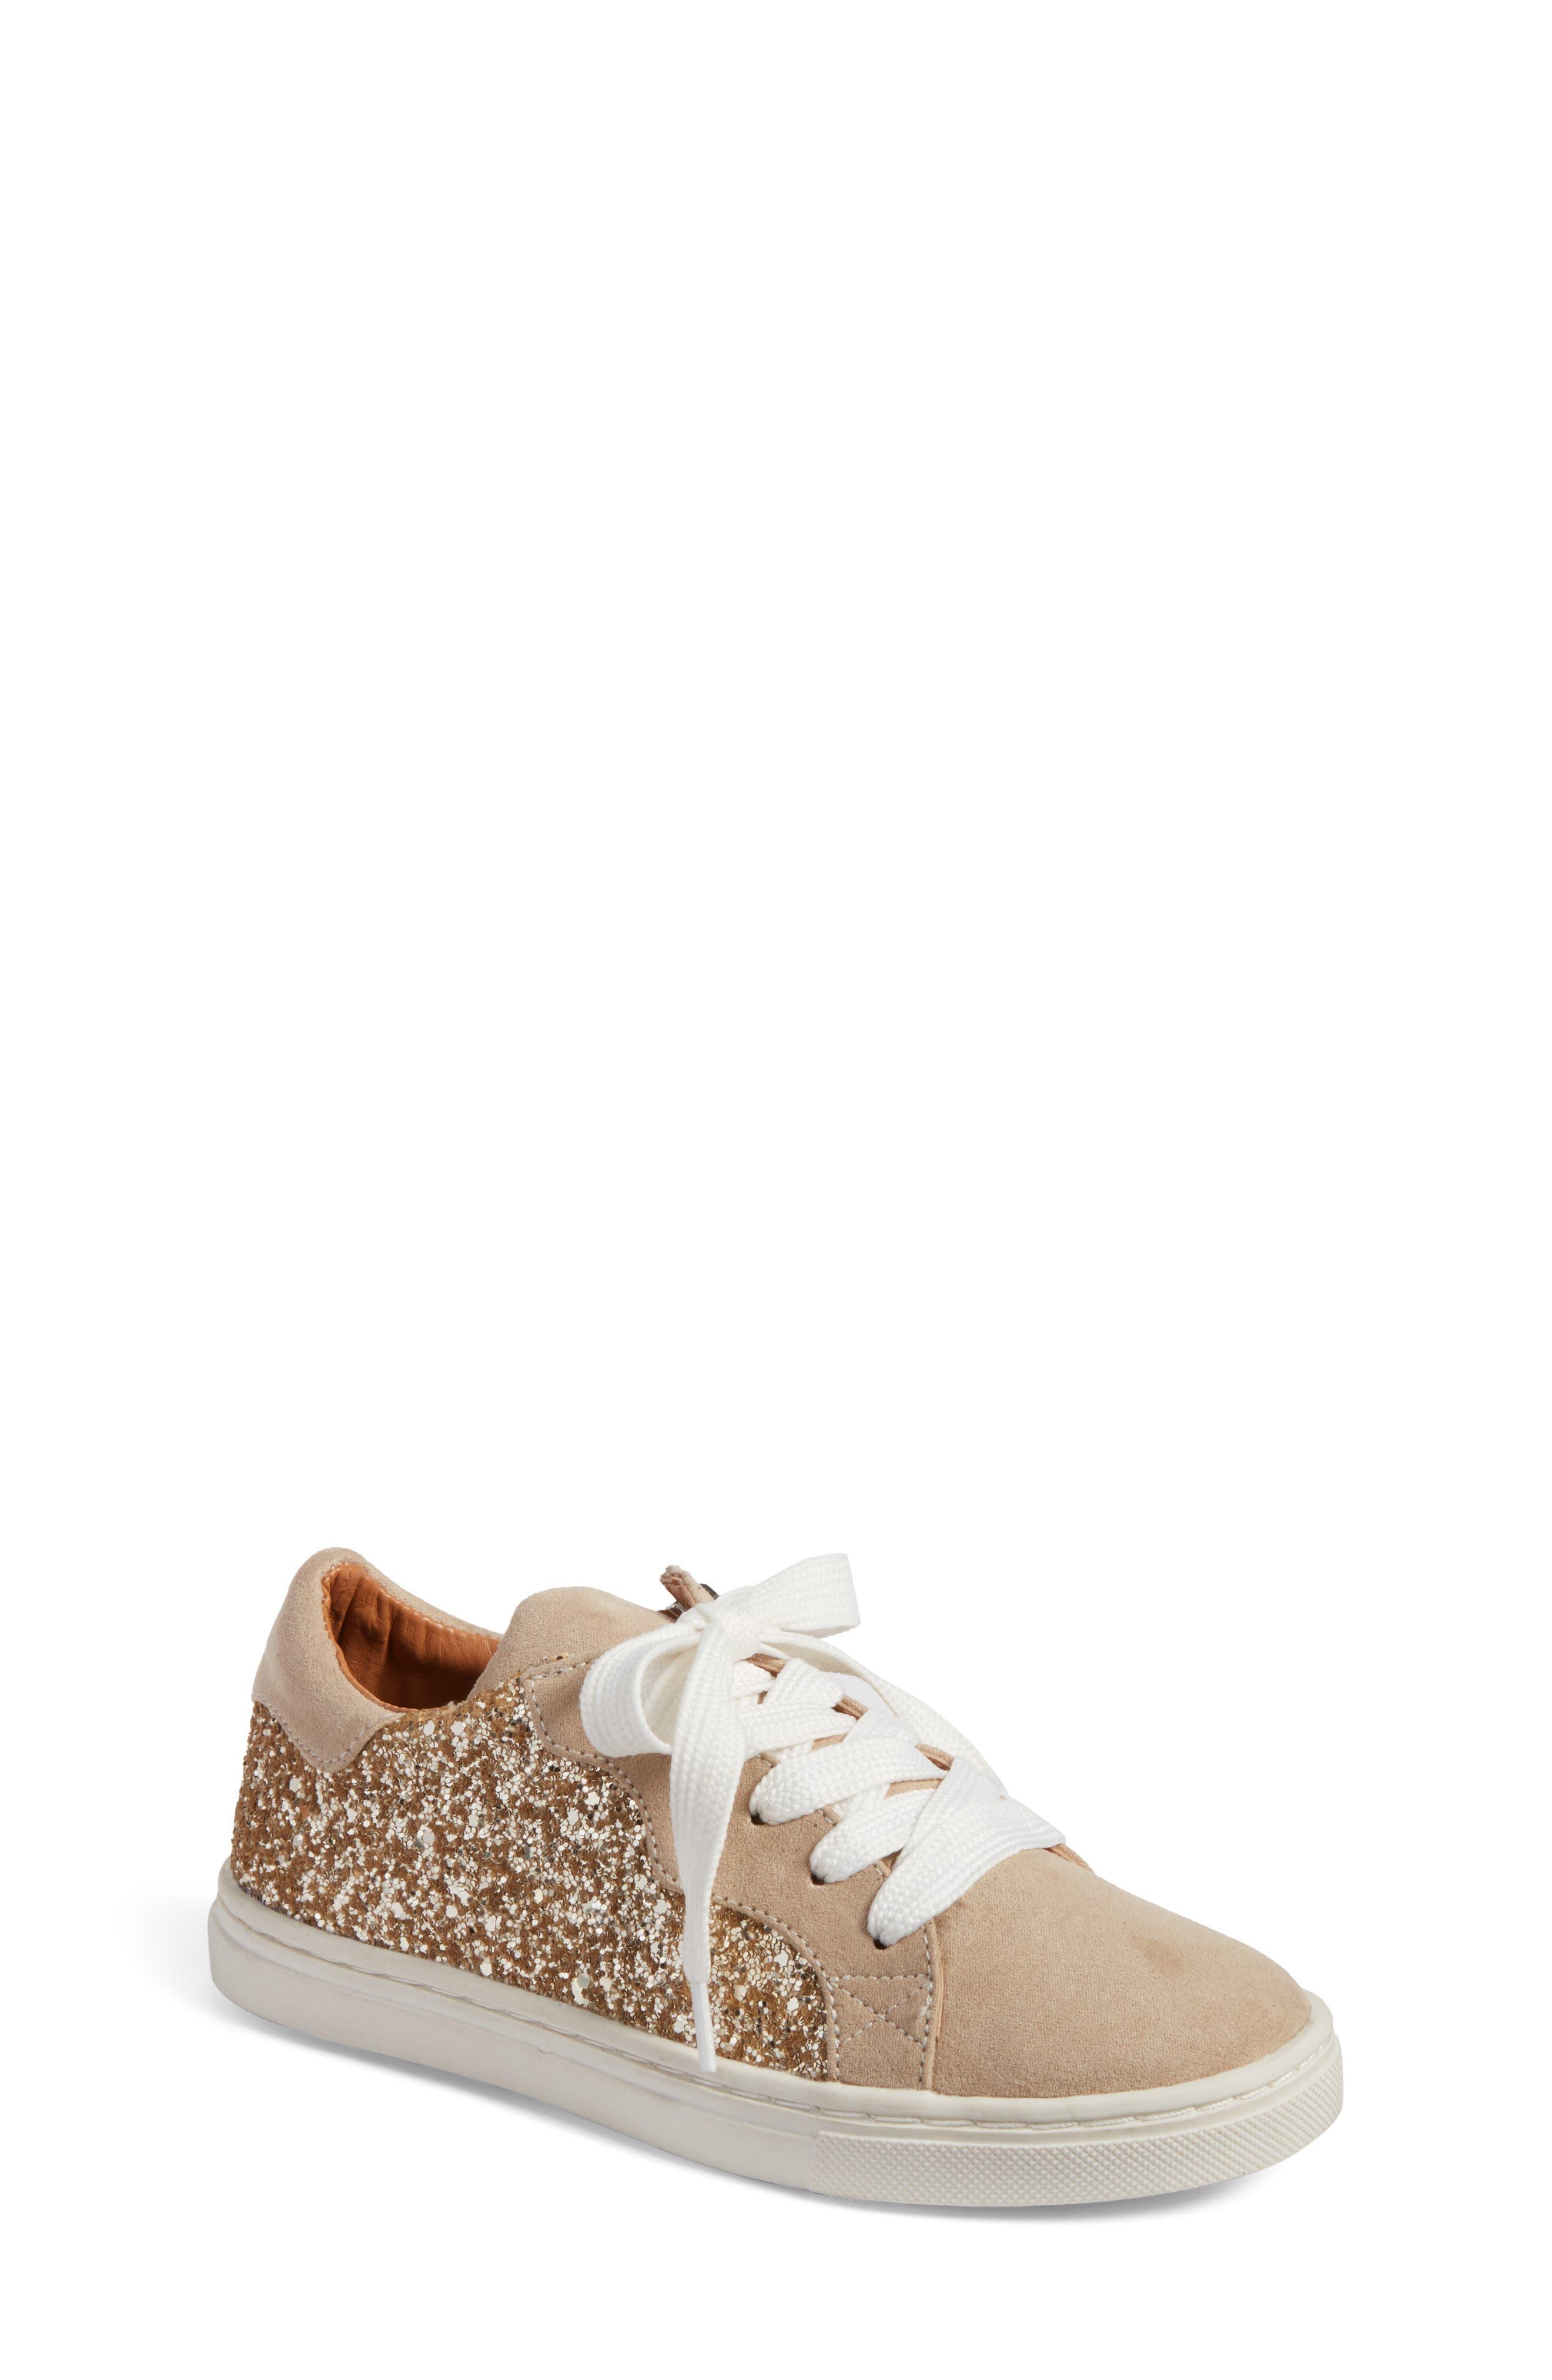 Zaida Low Top Sneaker,                         Main,                         color, Gold Glitter